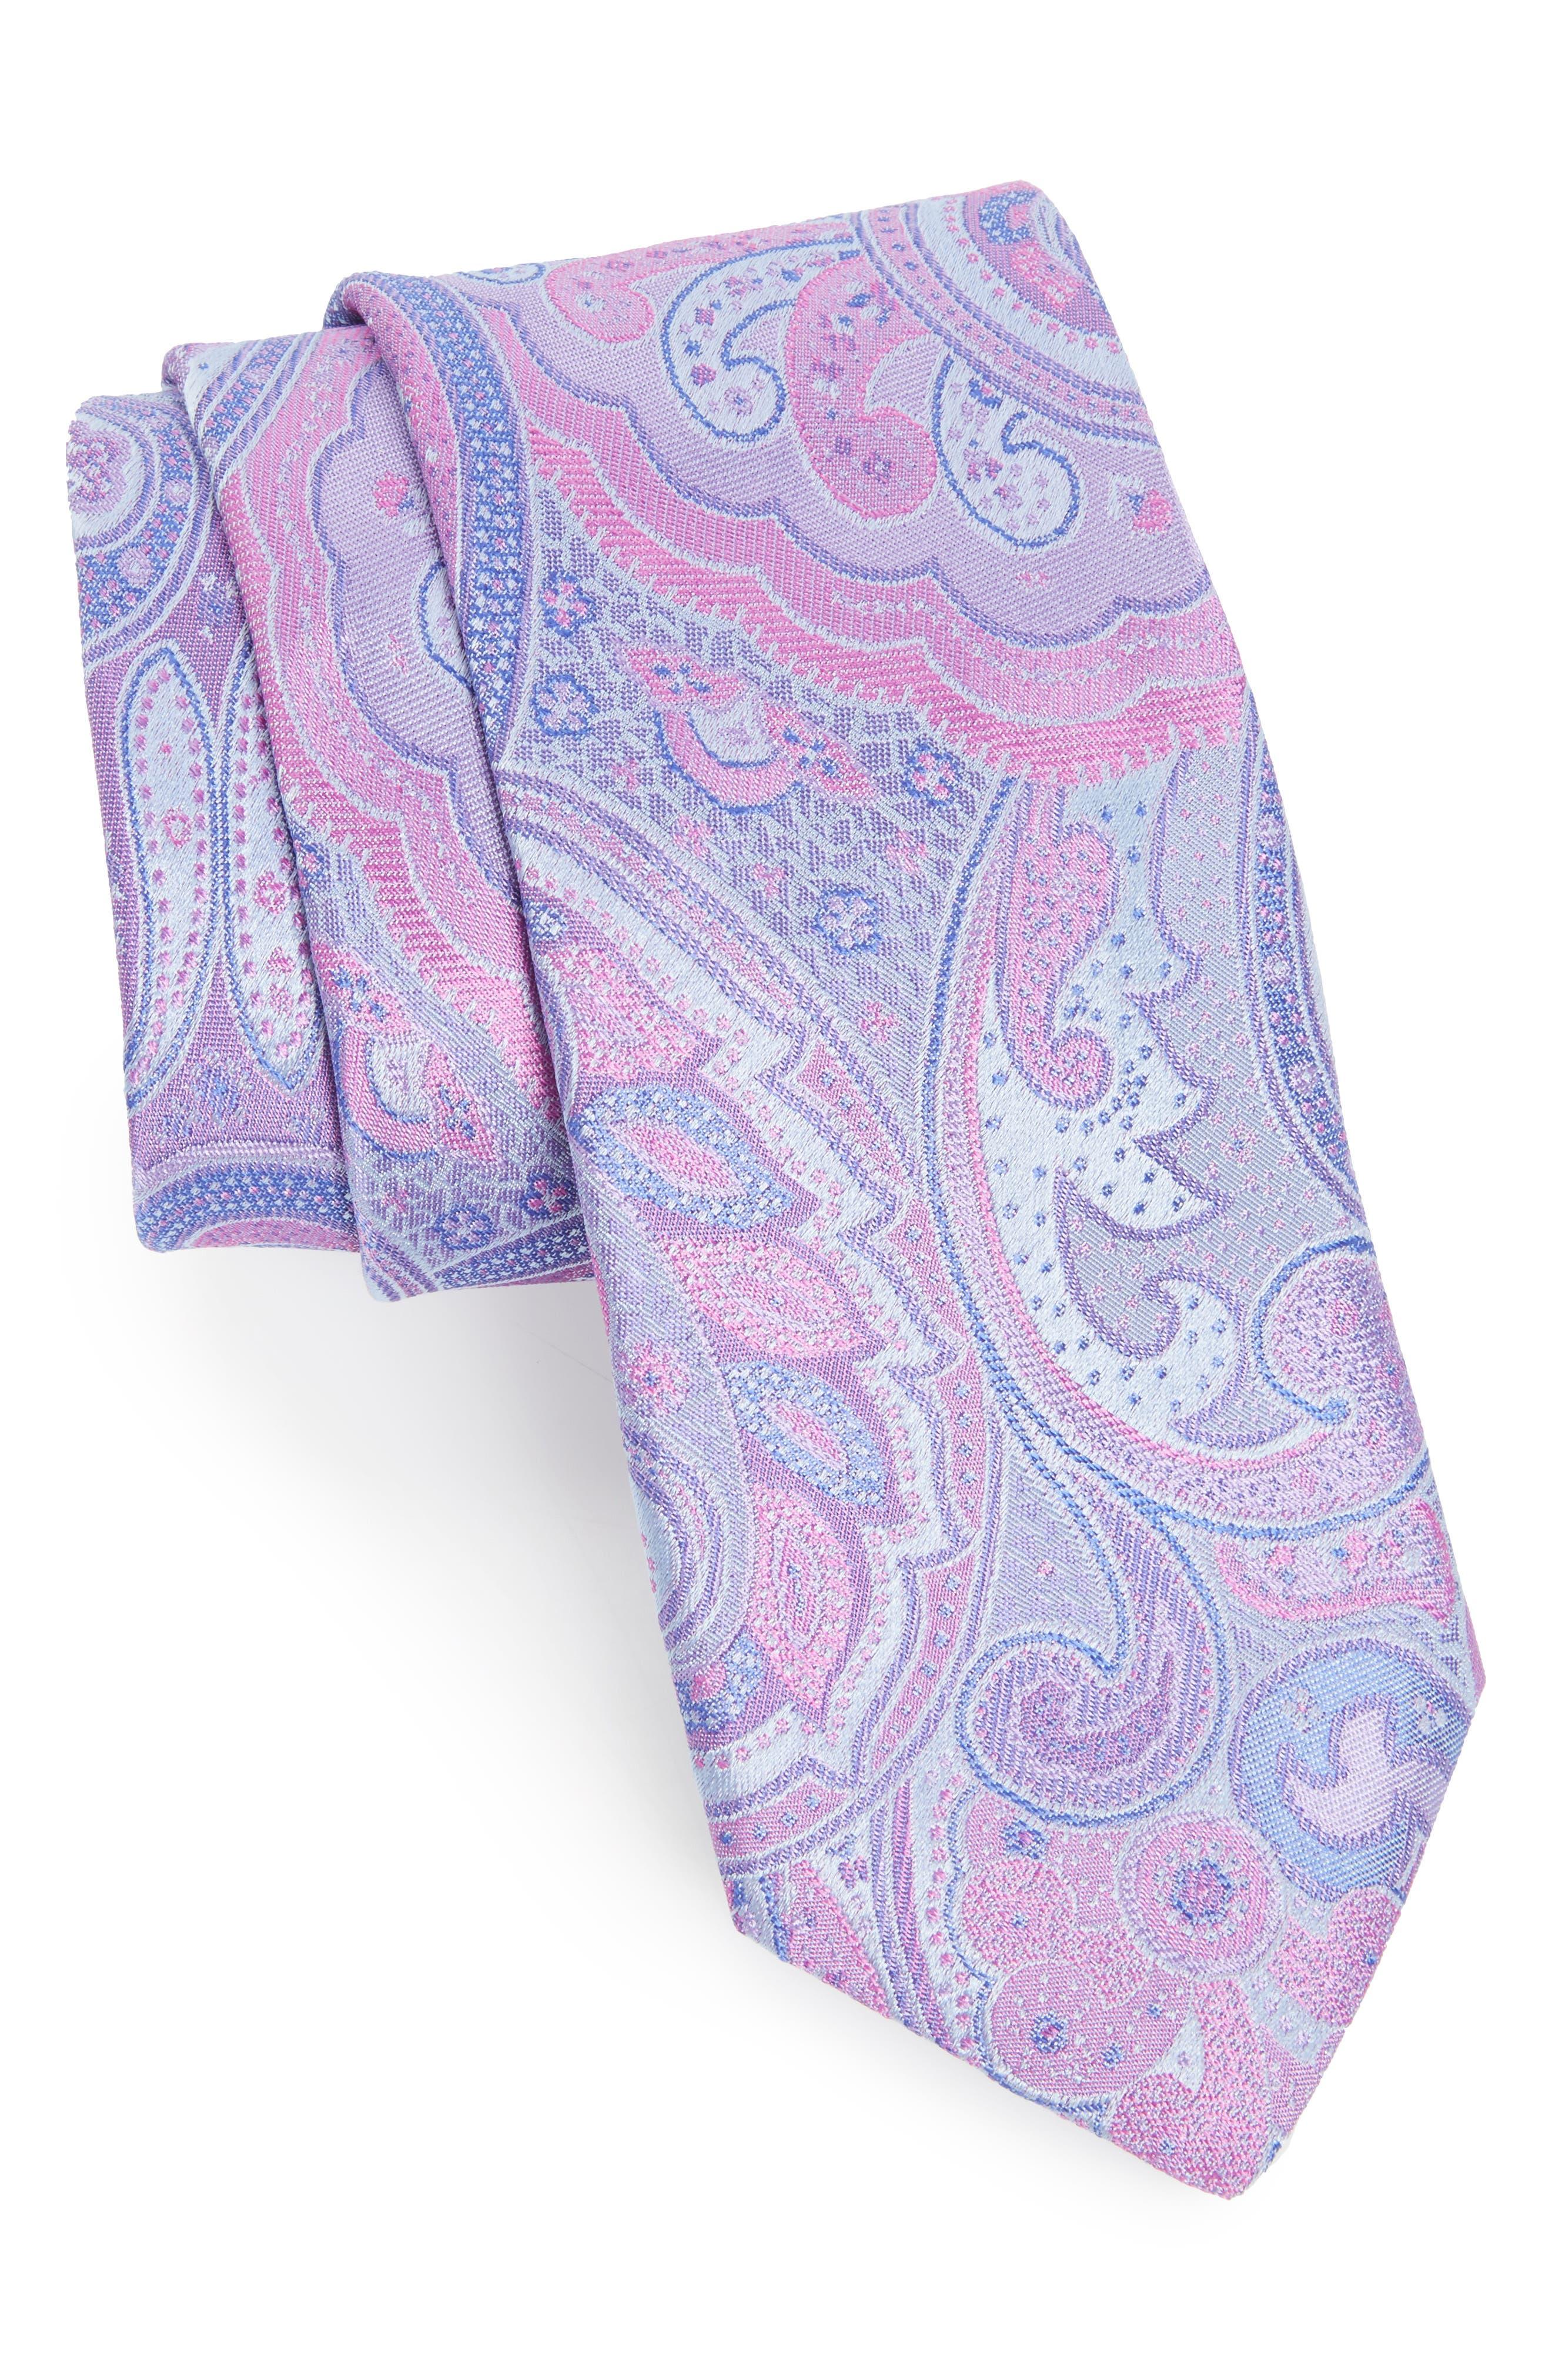 Alternate Image 1 Selected - Ted Baker London Paisley Silk Tie